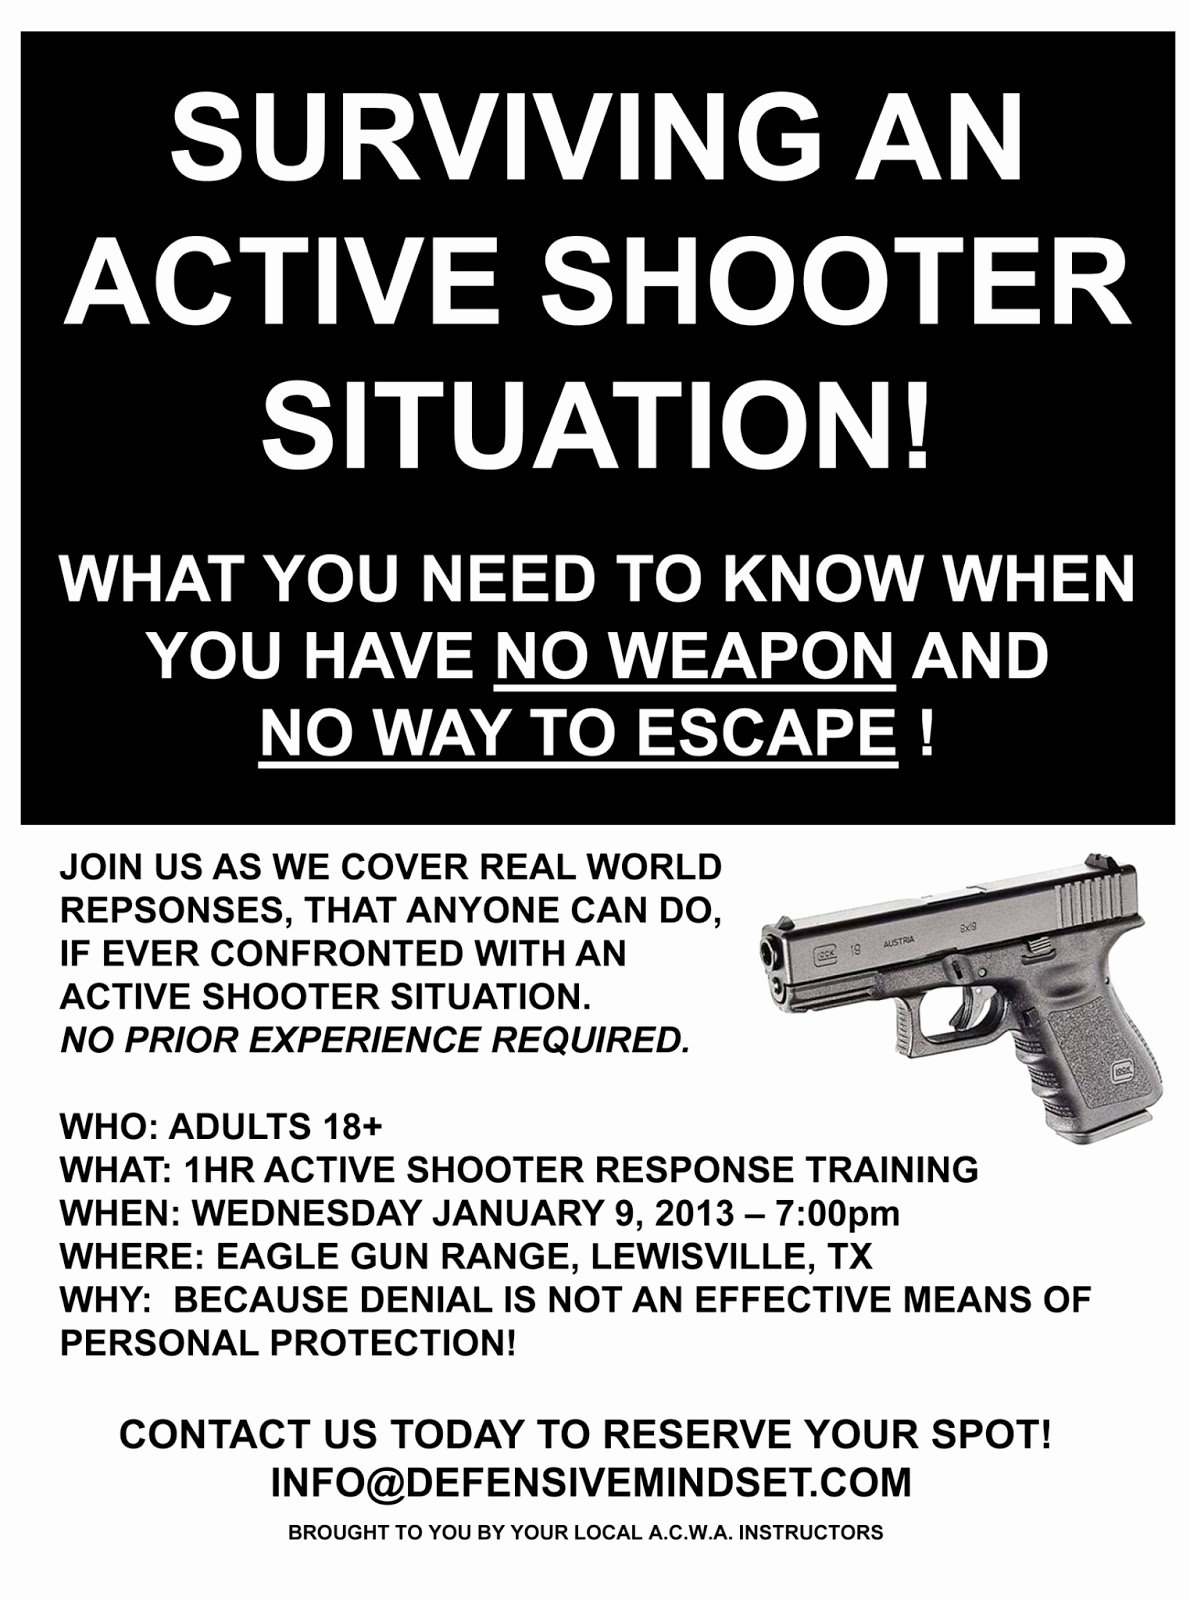 Active Shooter Response Plan Template Unique Defensive Mindset Active Shooter Response